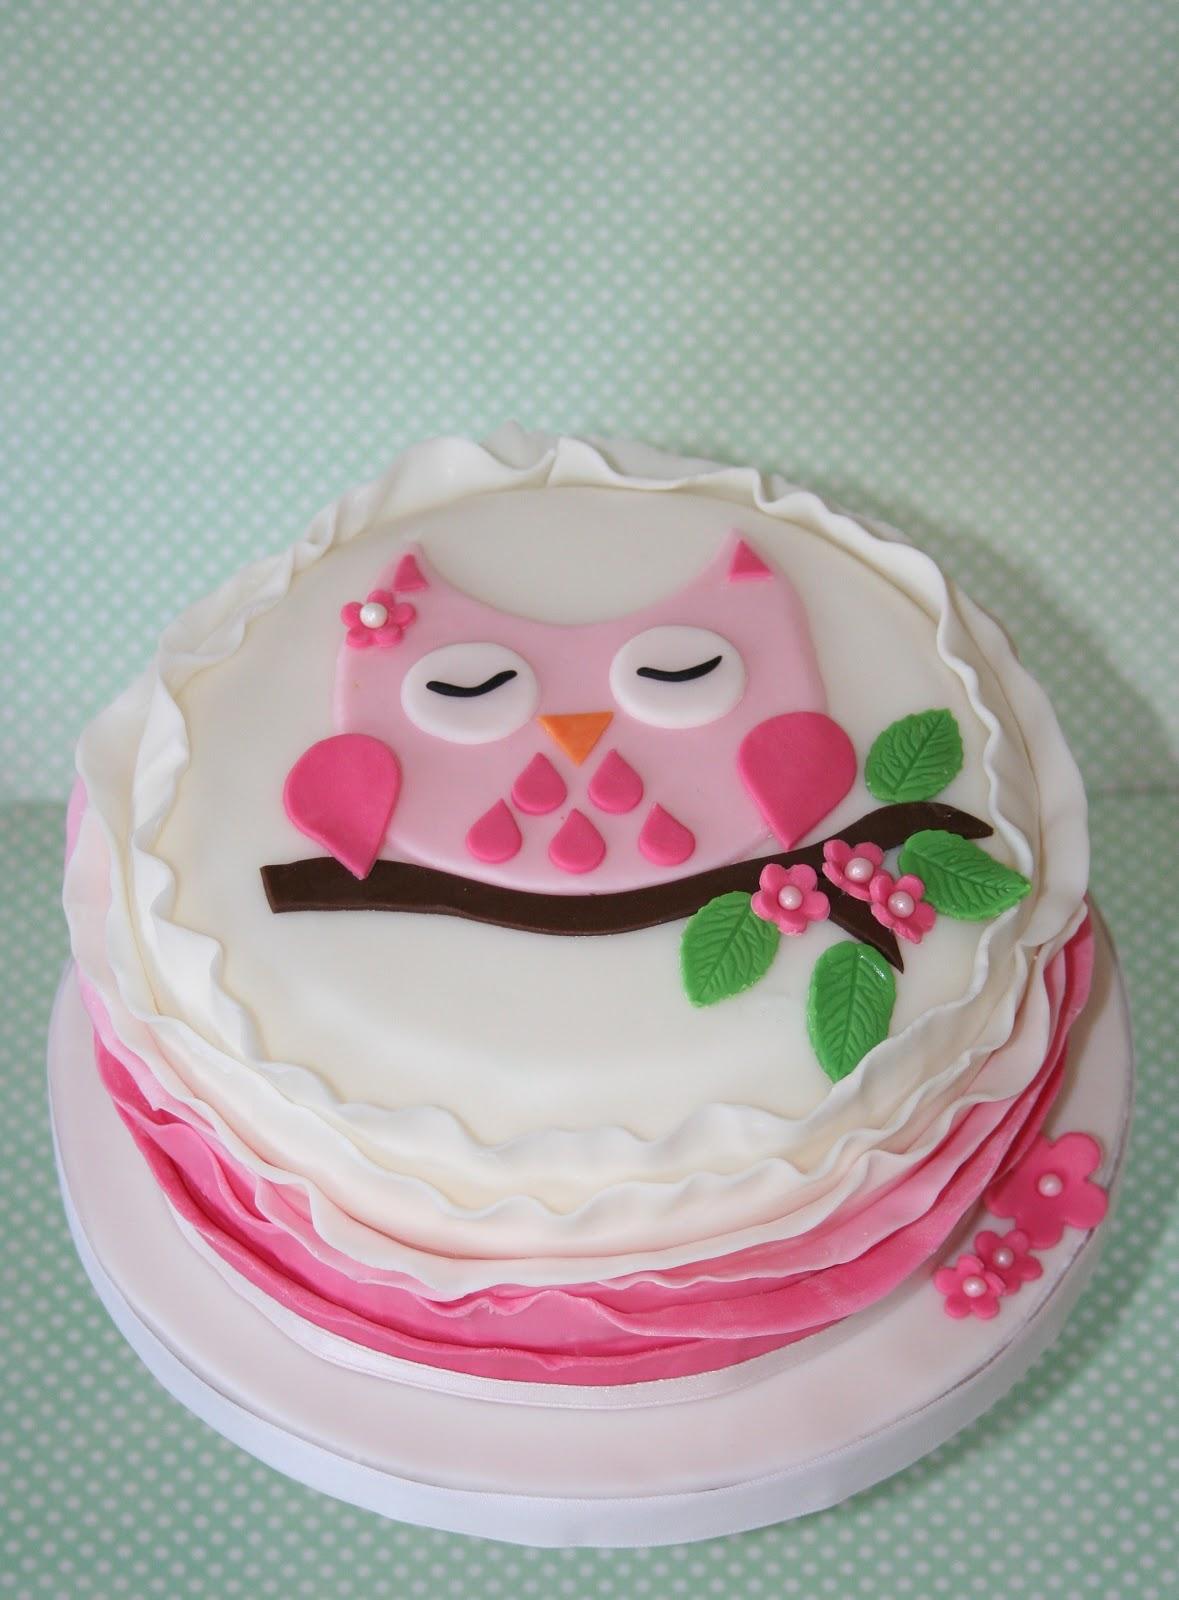 lemon tree bakery pretty pink owl with ruffles